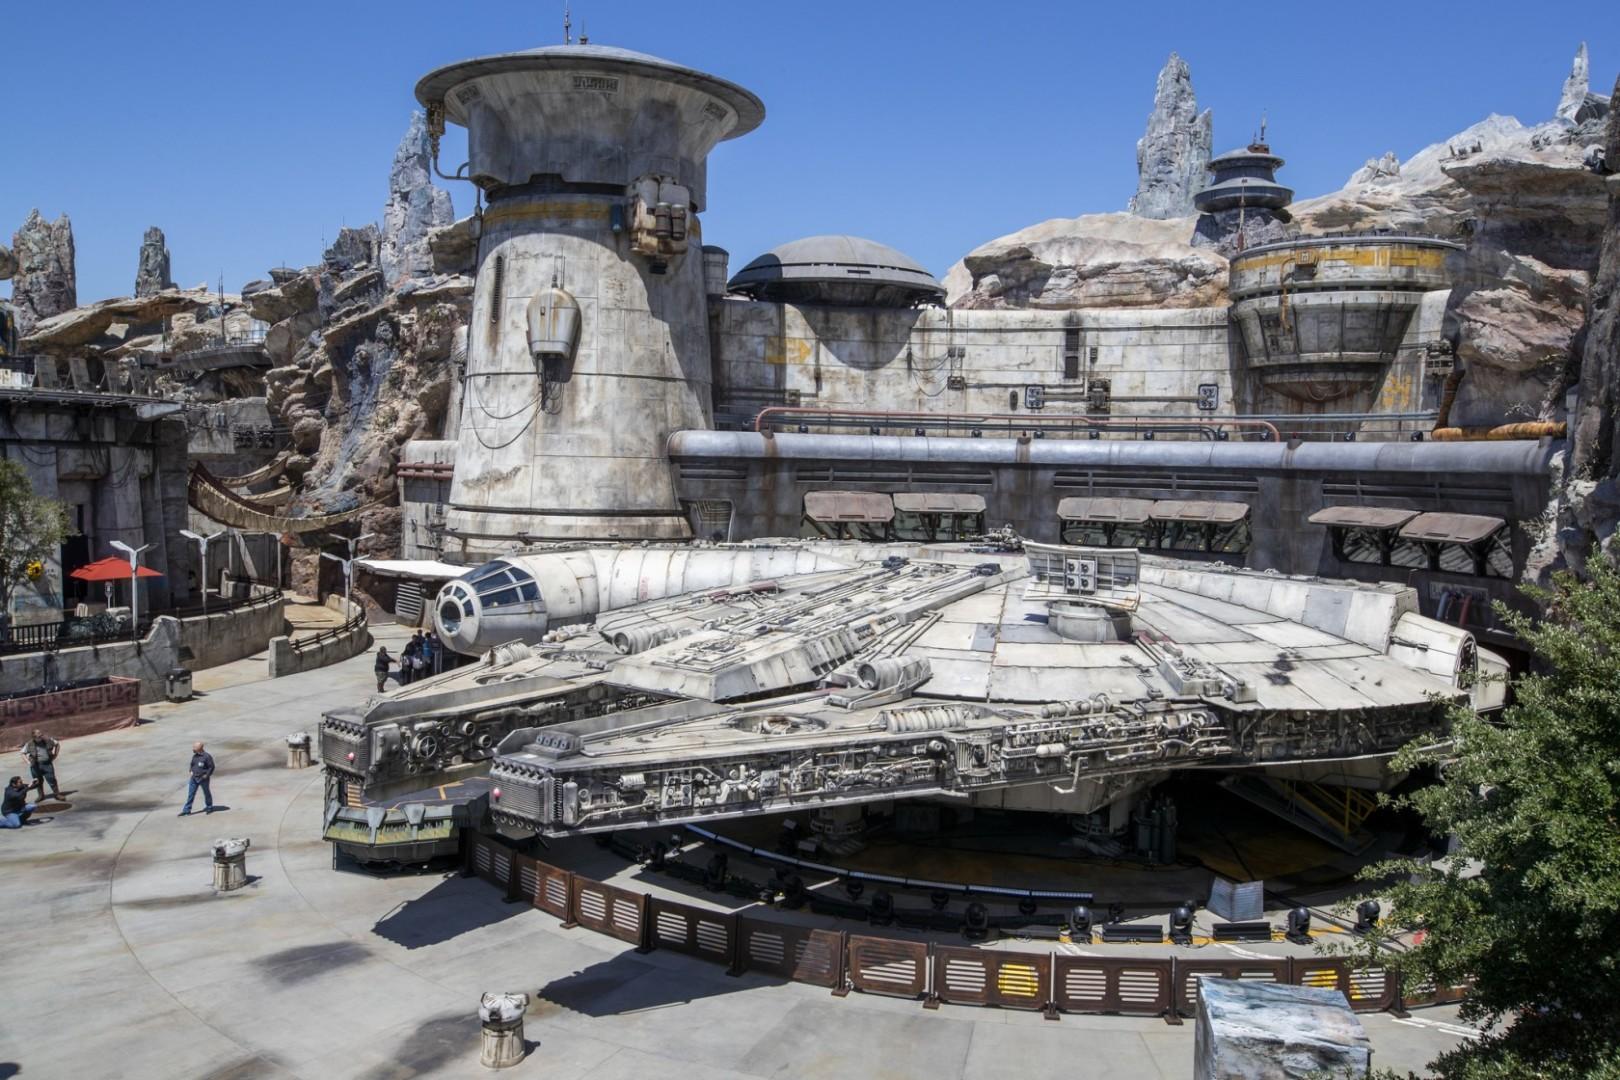 Star Wars ILMxLAB Tales from the Galaxys Edge VR